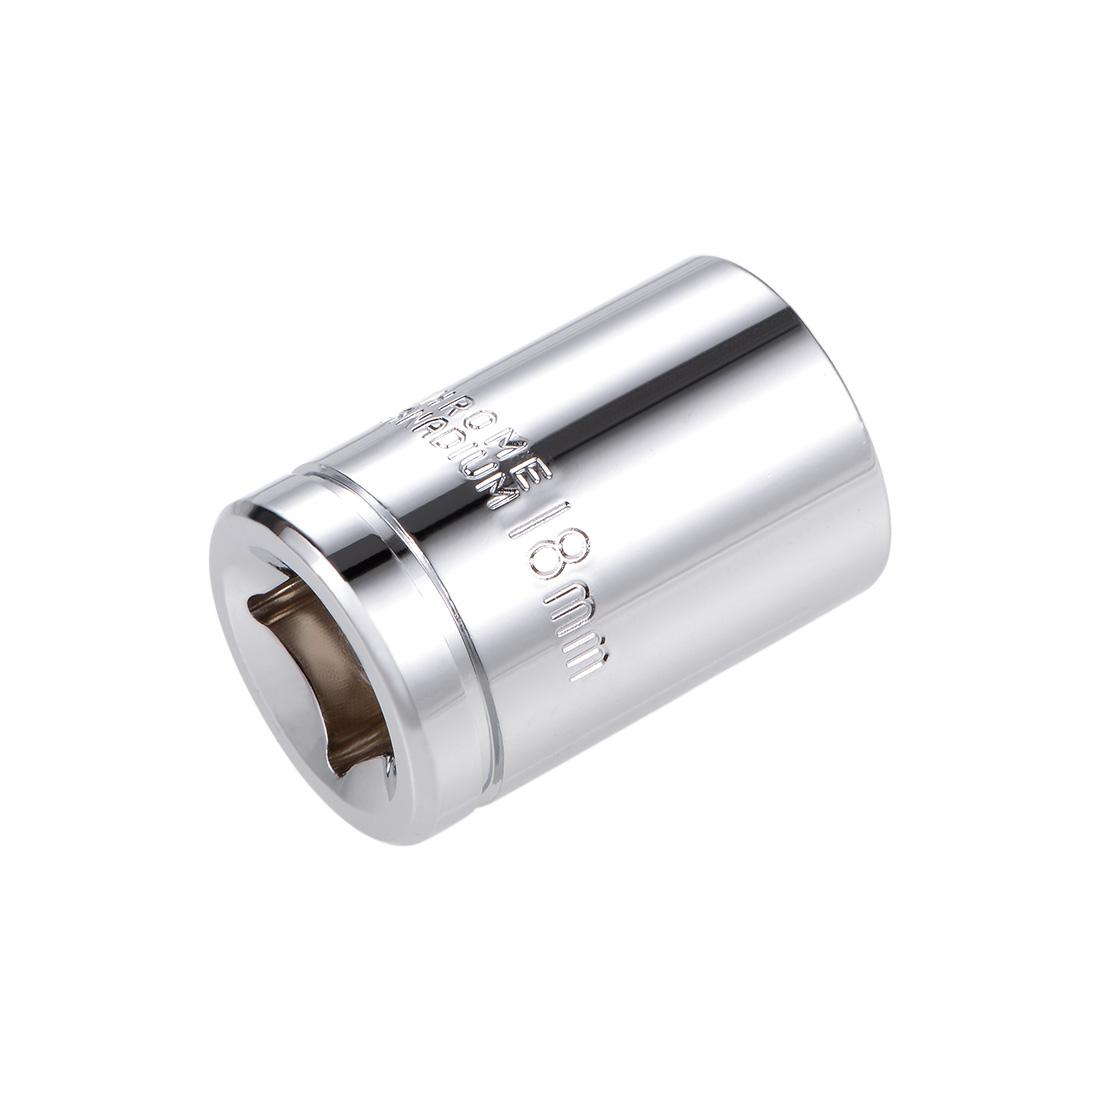 1/2-inch Drive E18 Universal Spline Socket Shallow 12 Point Cr-V Steel